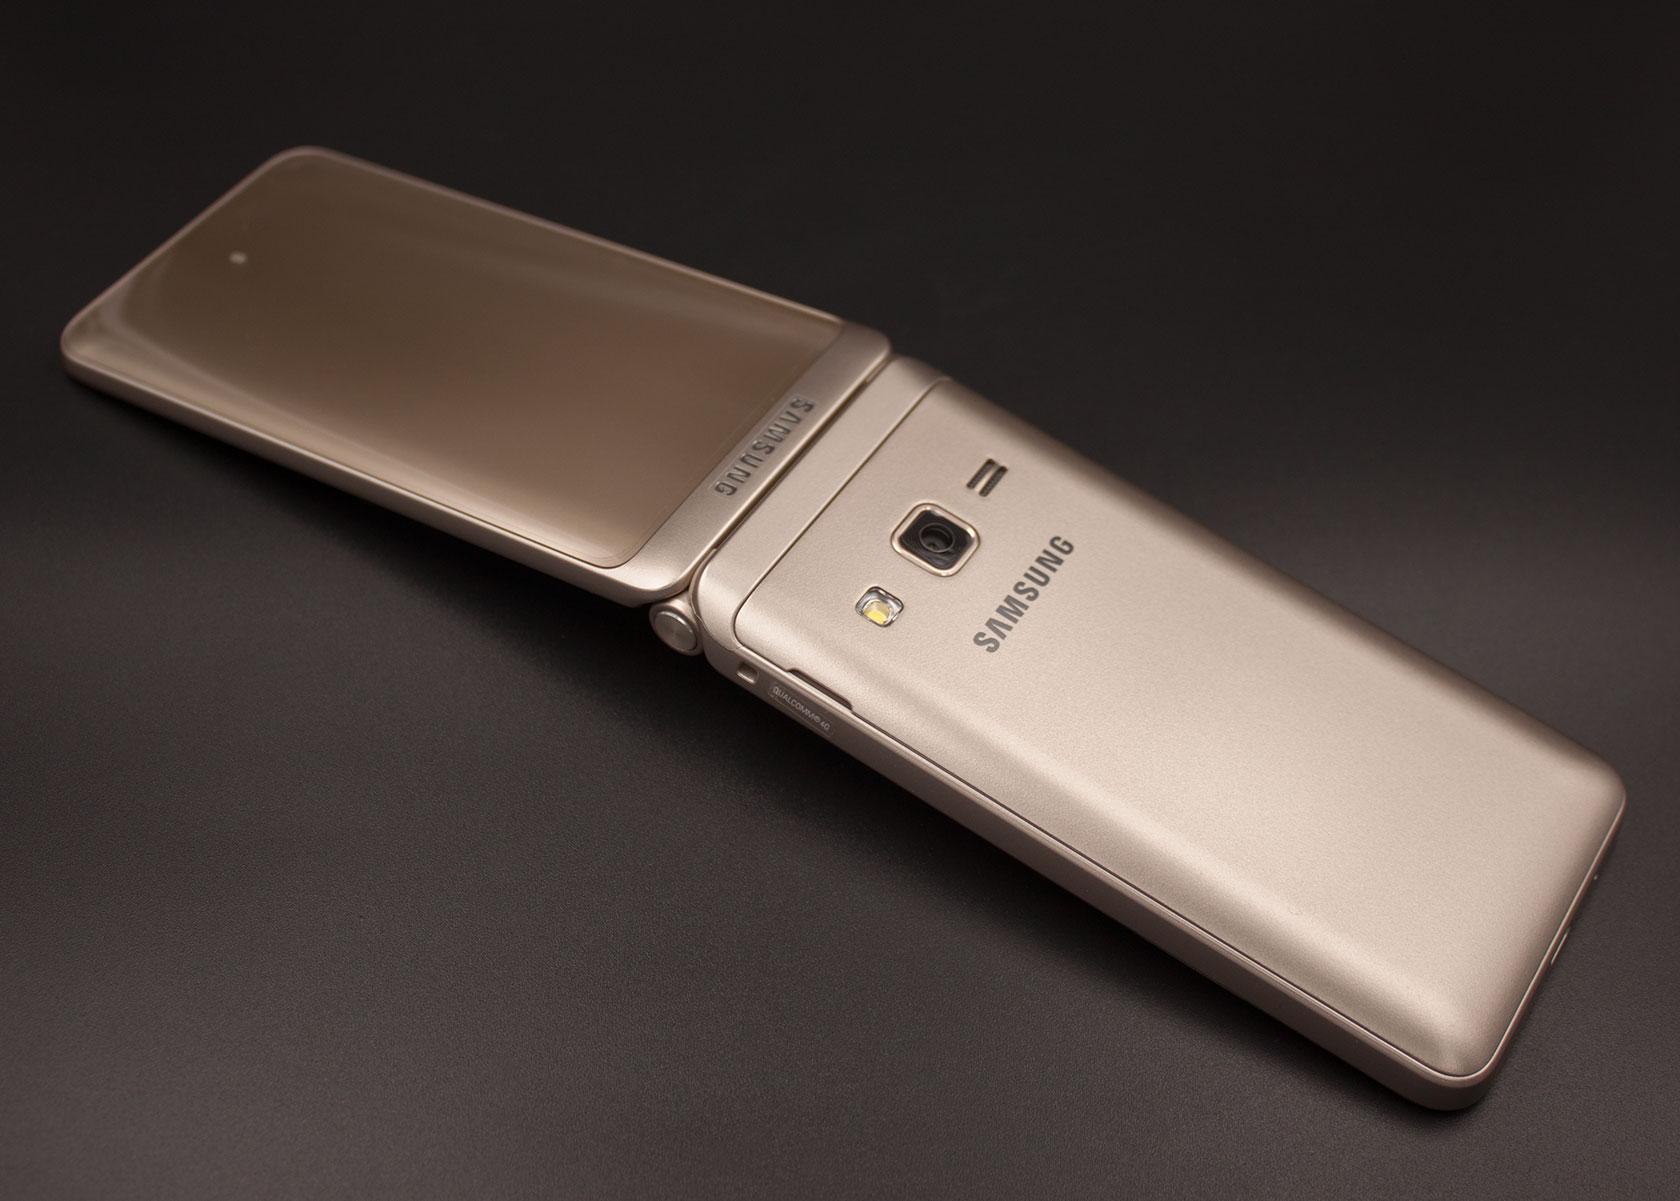 Телефоны самсунг раскладушка каталог с ценами фото